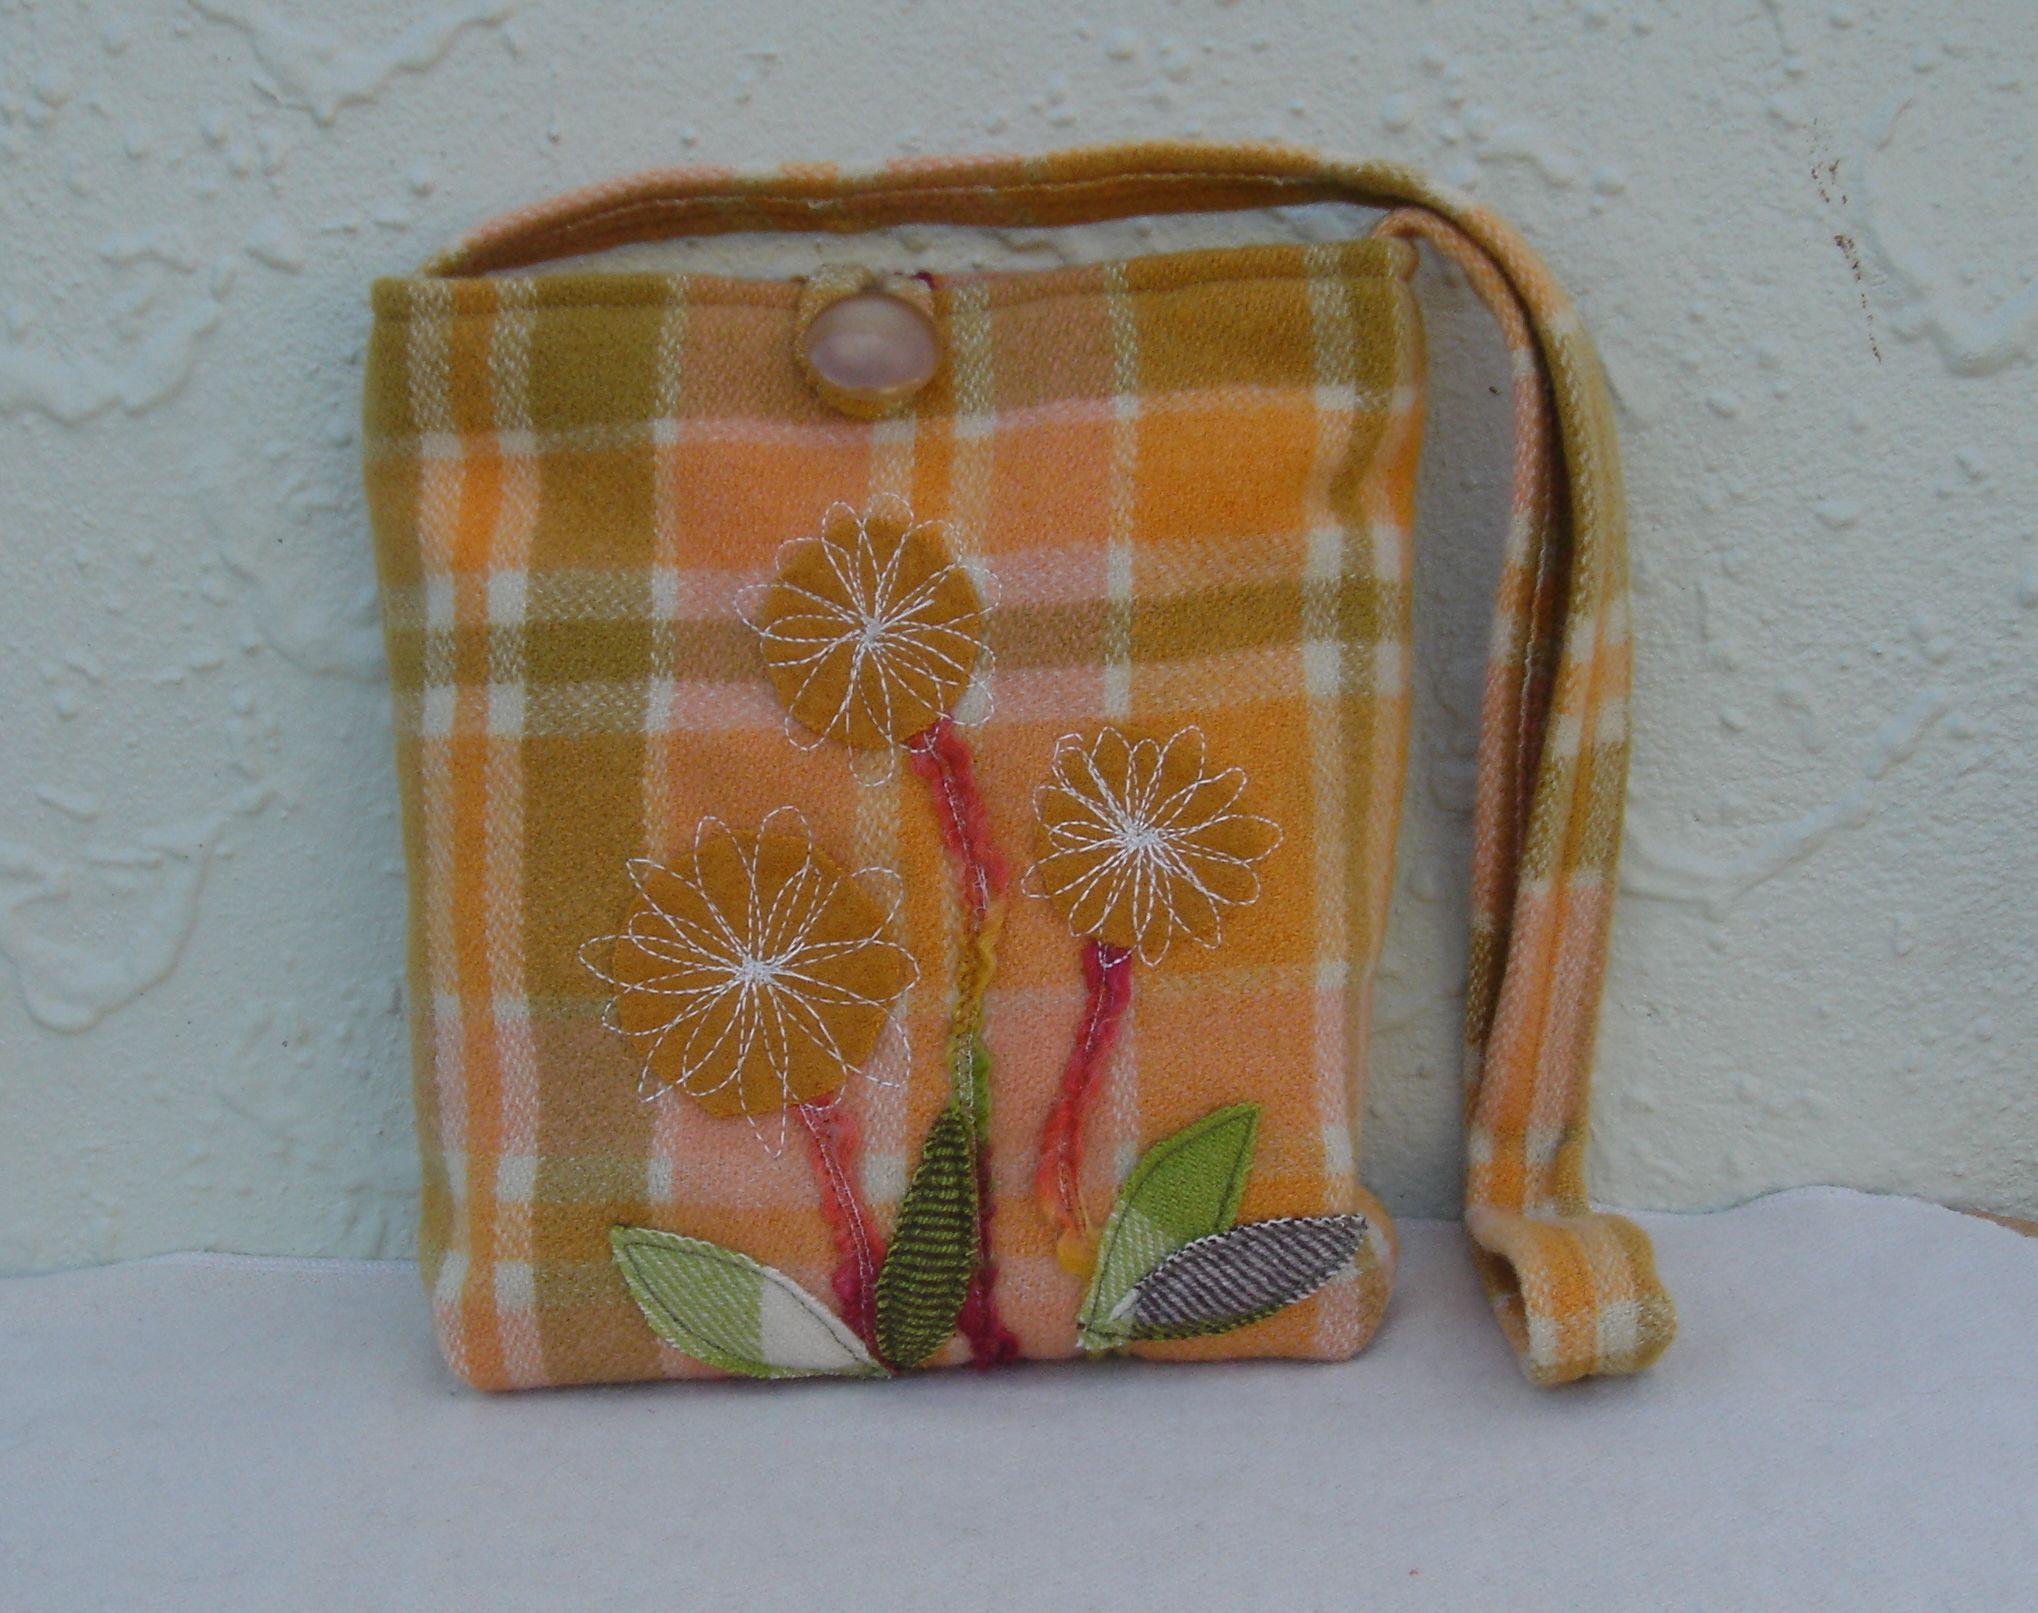 Repurposed woolen blanket. A lovely Spring bag.